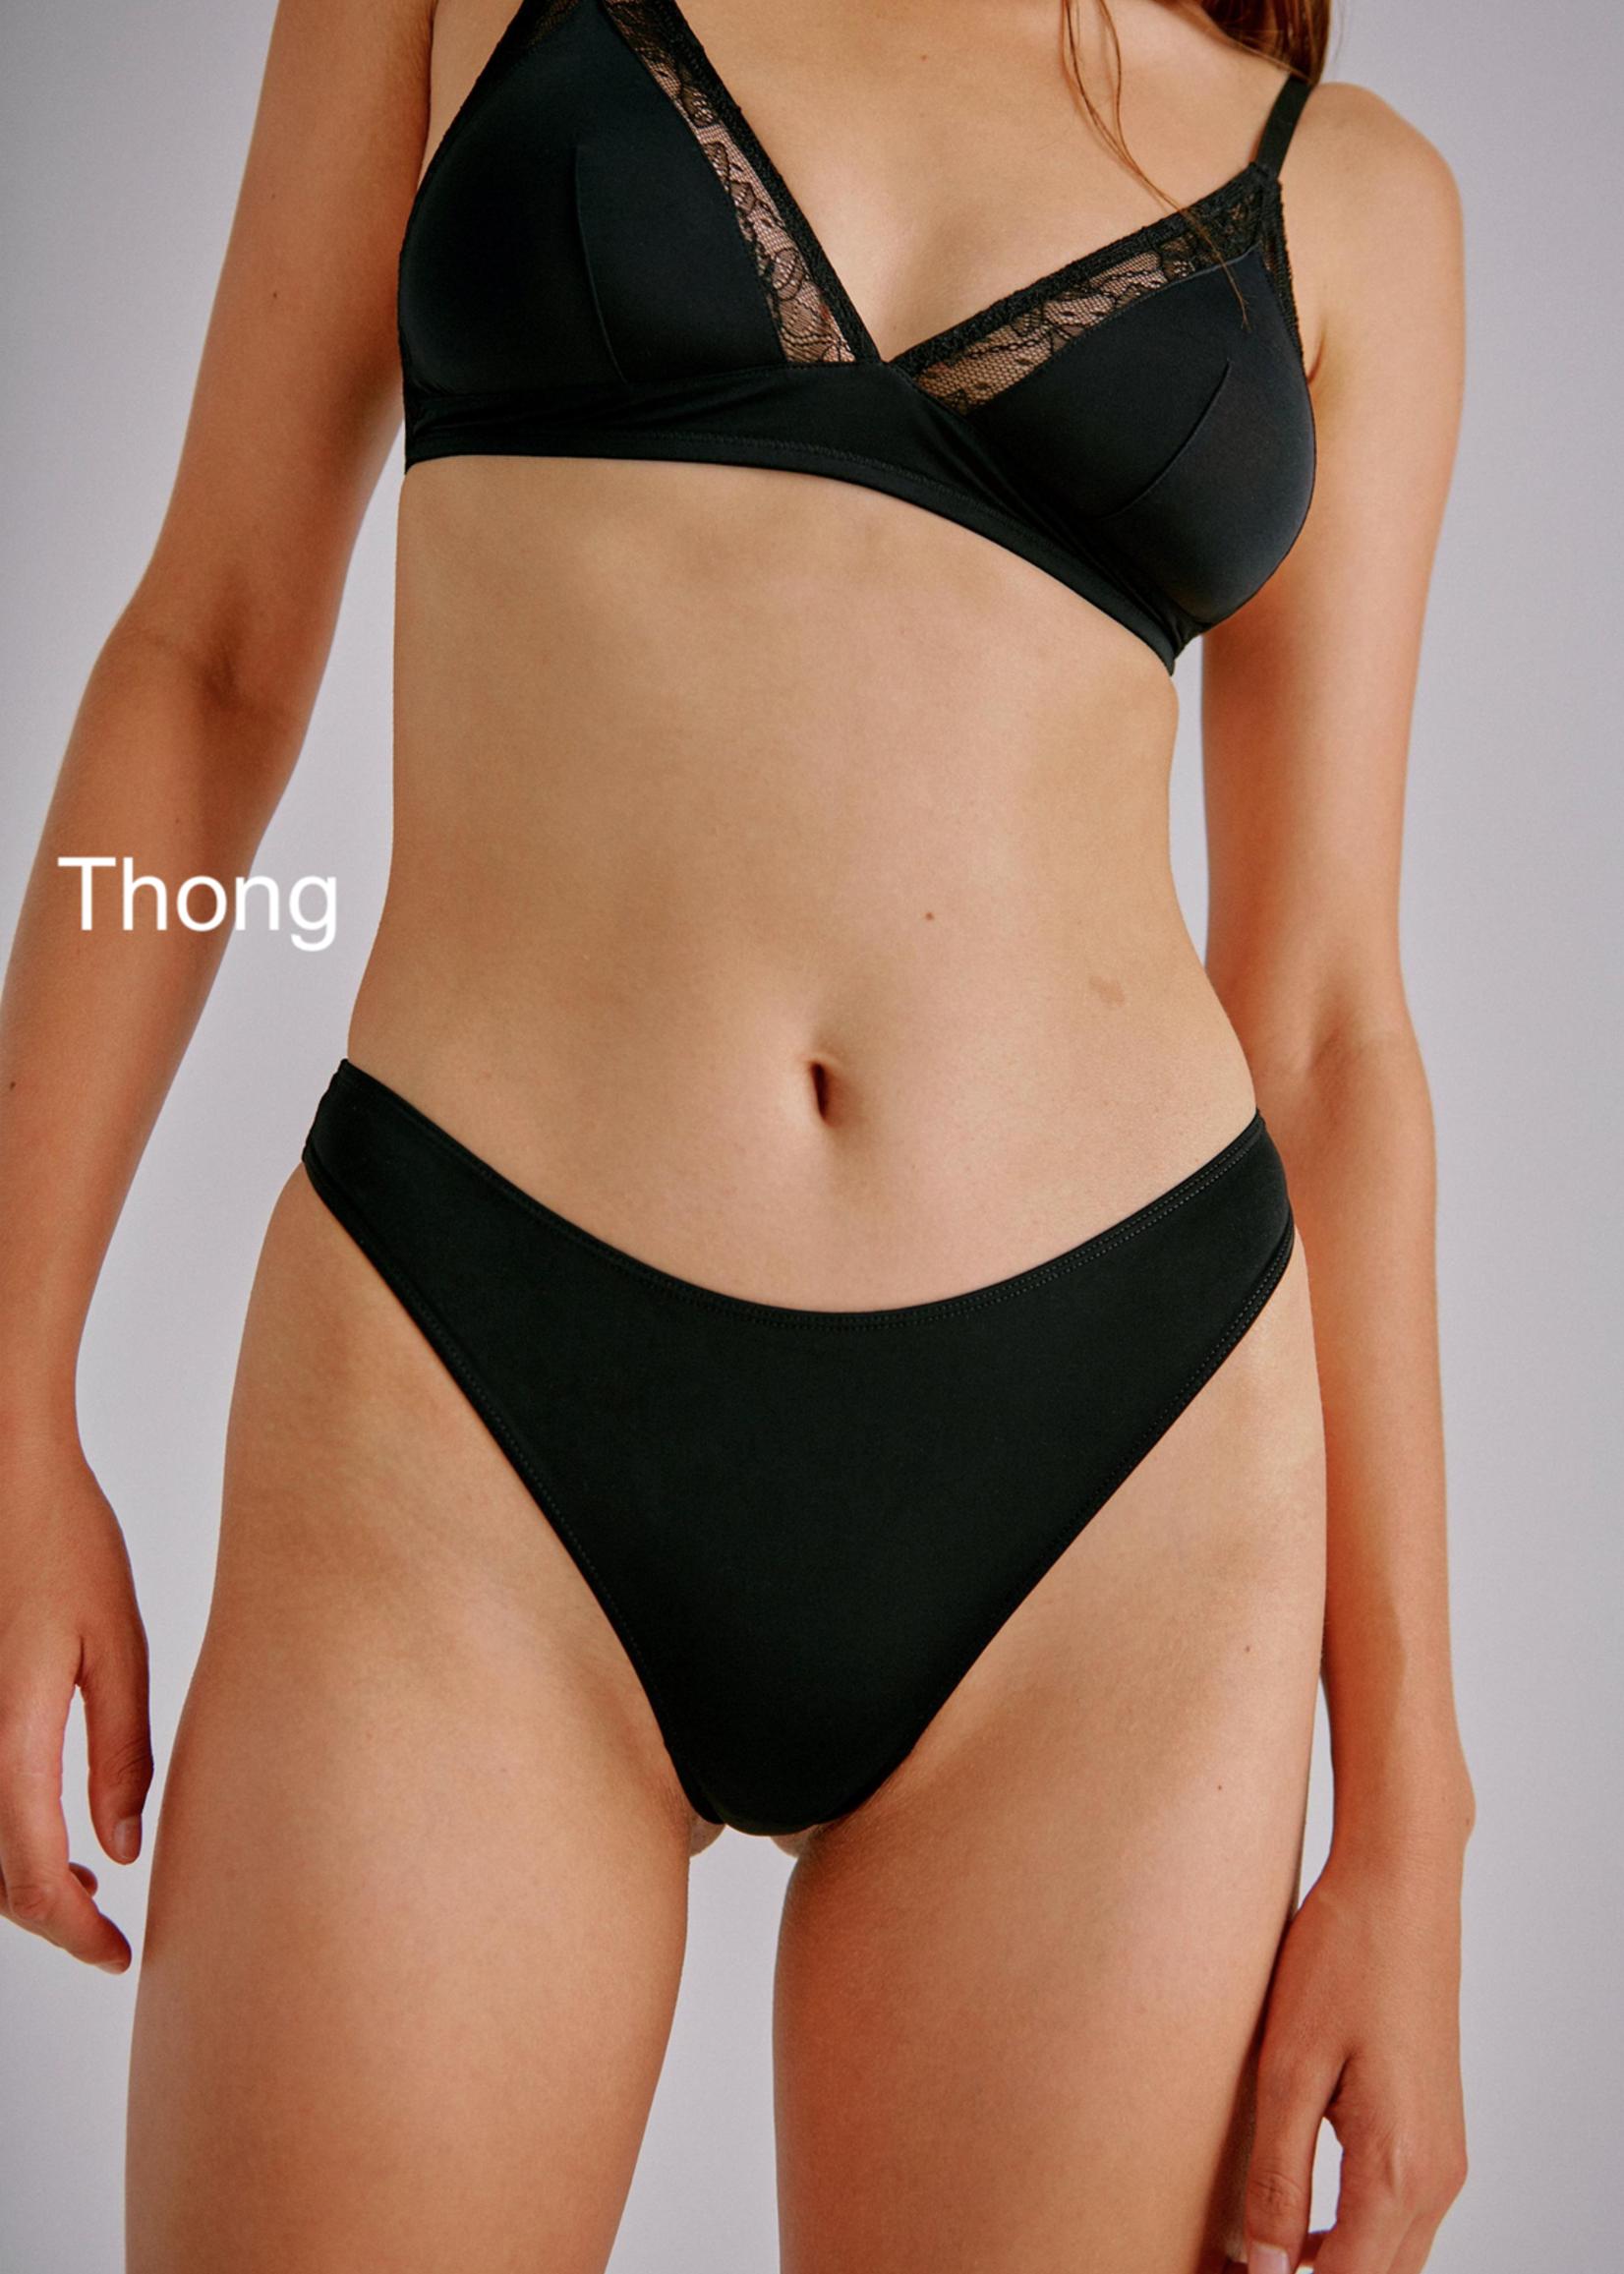 Blush Lingerie Microfiber Underwear